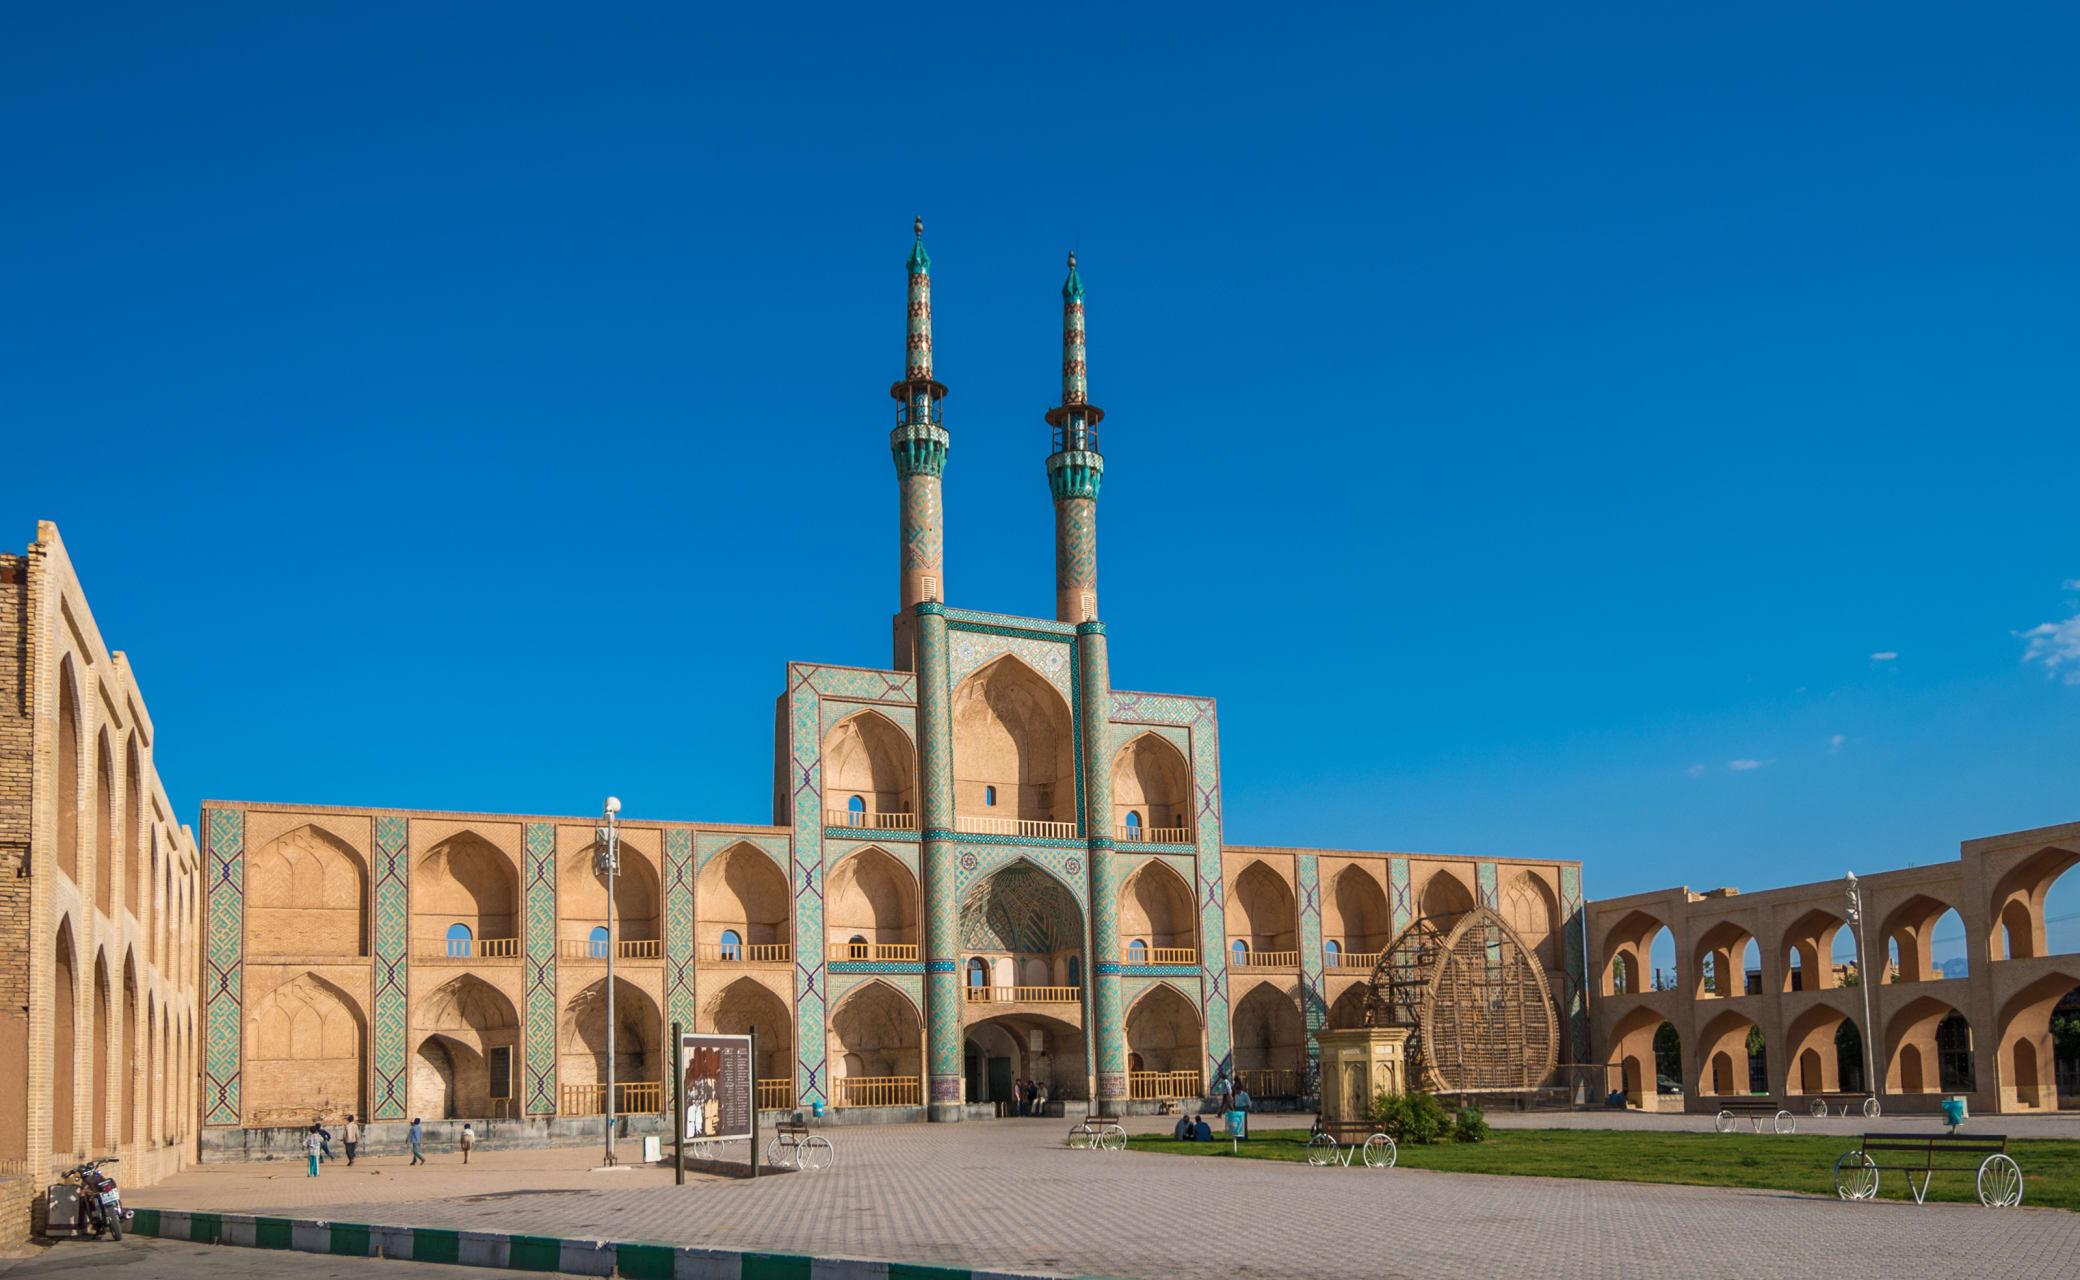 Yazd - Amir Chakhmaq Square, Yazd